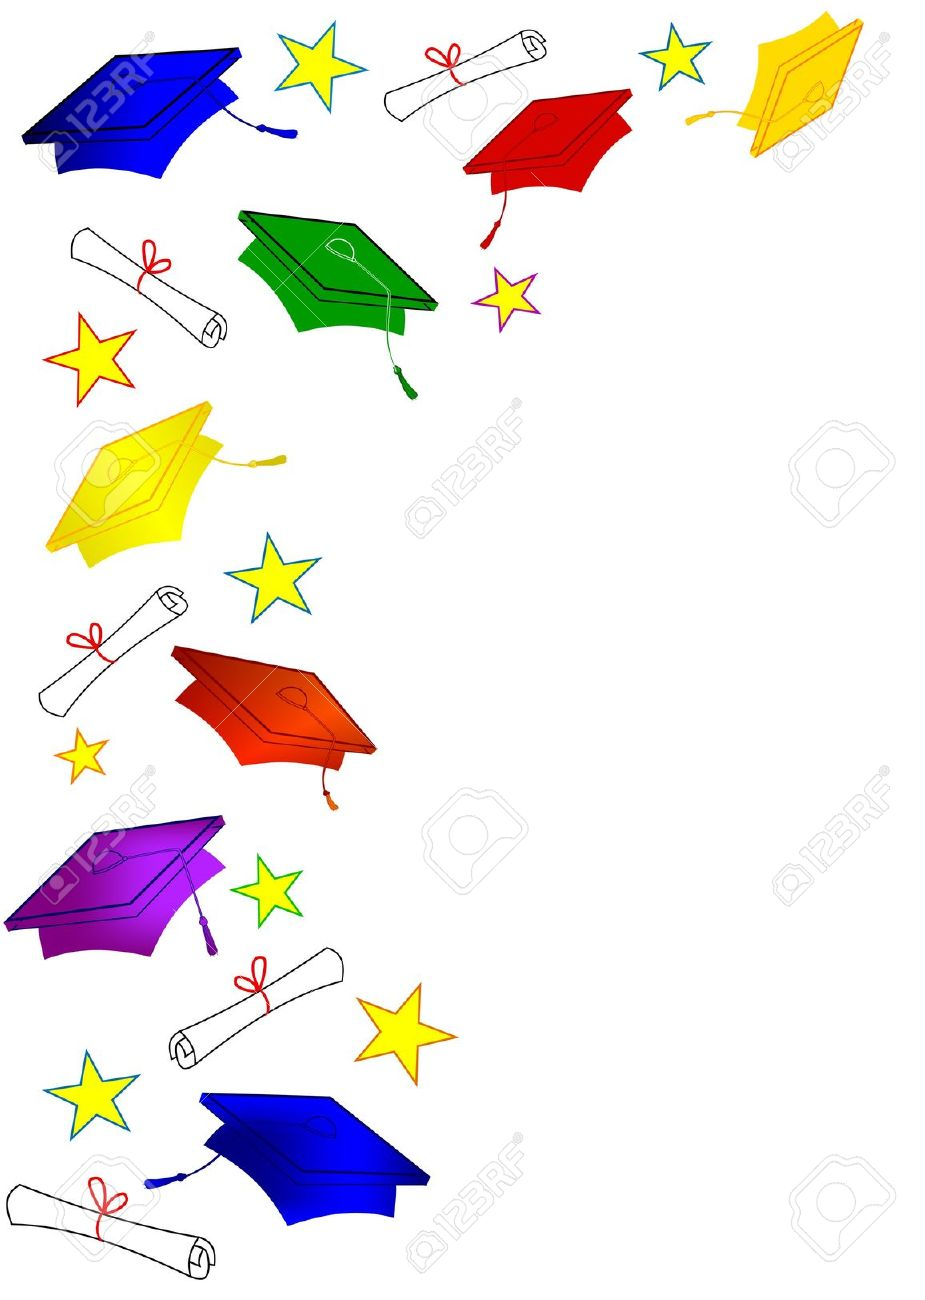 Graduation borders clipart free download Best Graduation Border #11933 - Clipartion.com free download